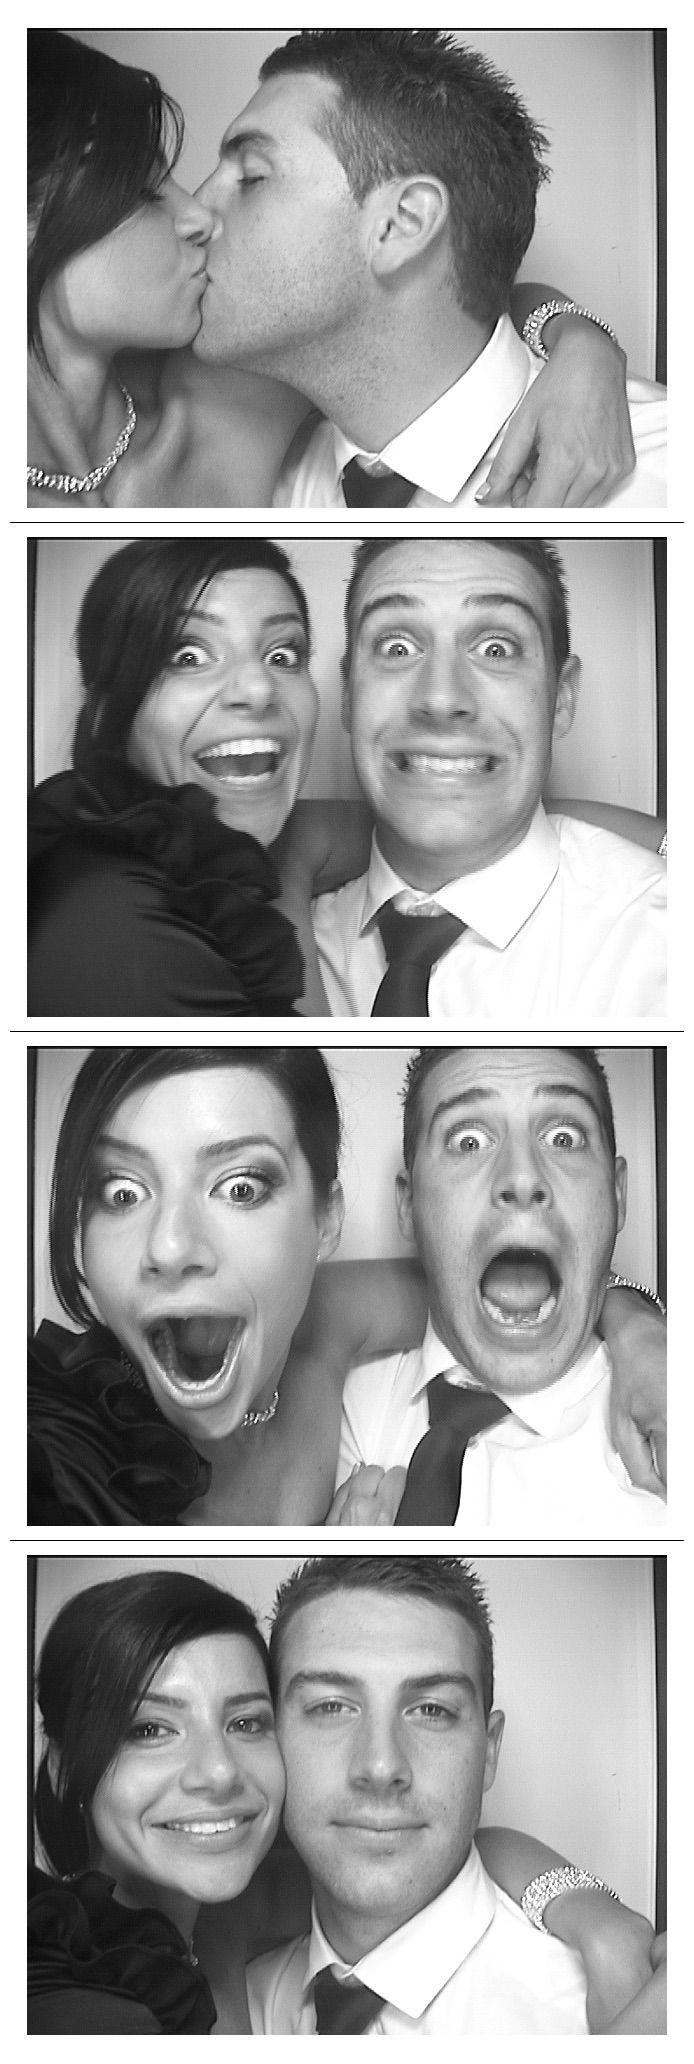 photo booth hire wedding   www.flashbackphotobooths.com.au